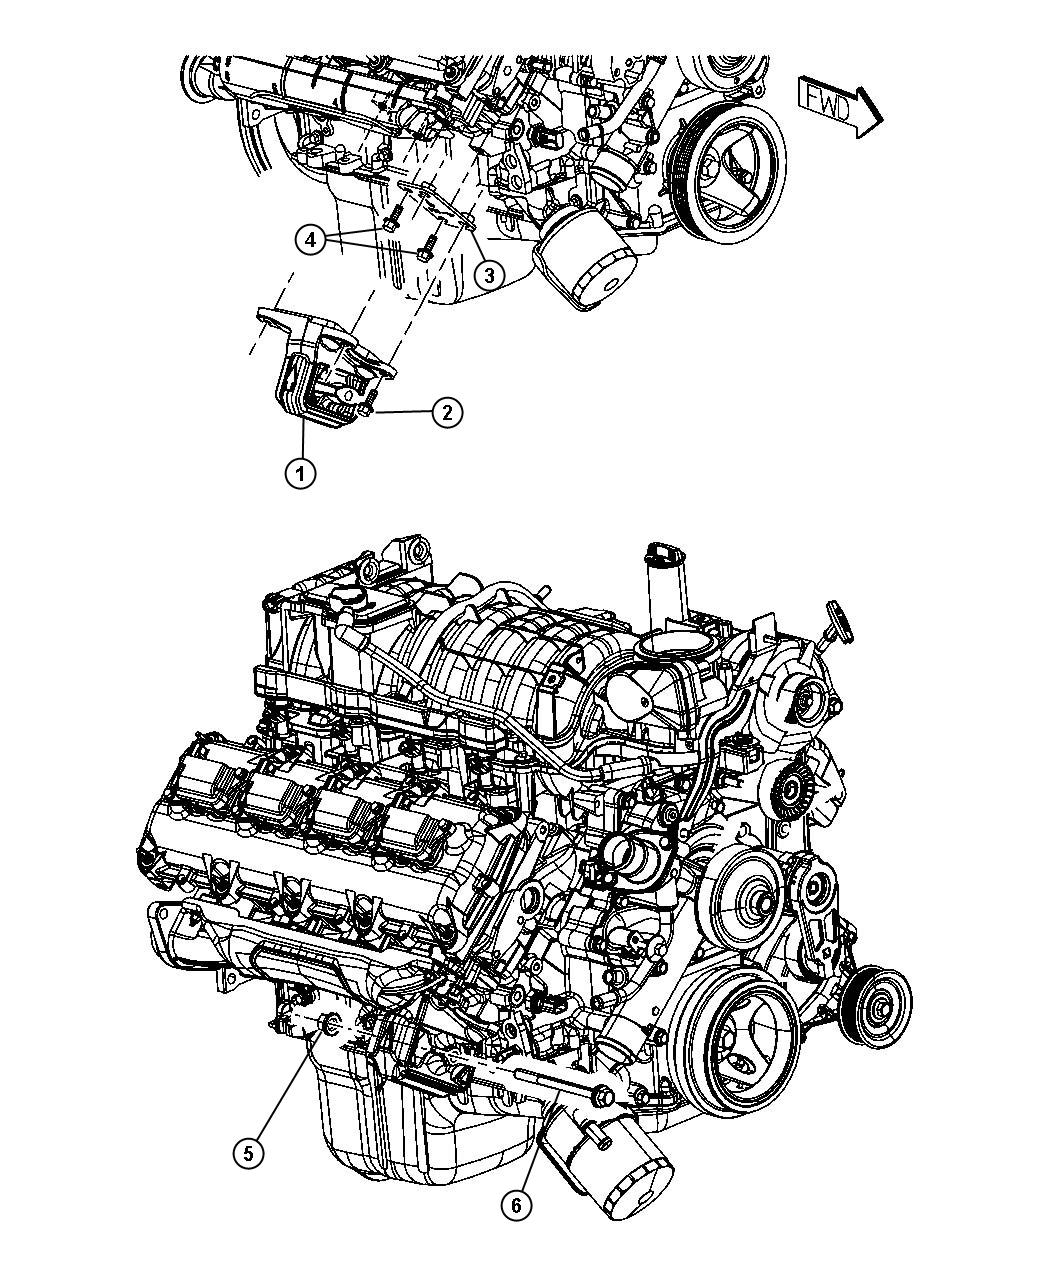 Dodge Ram Insulator Engine Mount Right Side Mounting Rwd Ezc